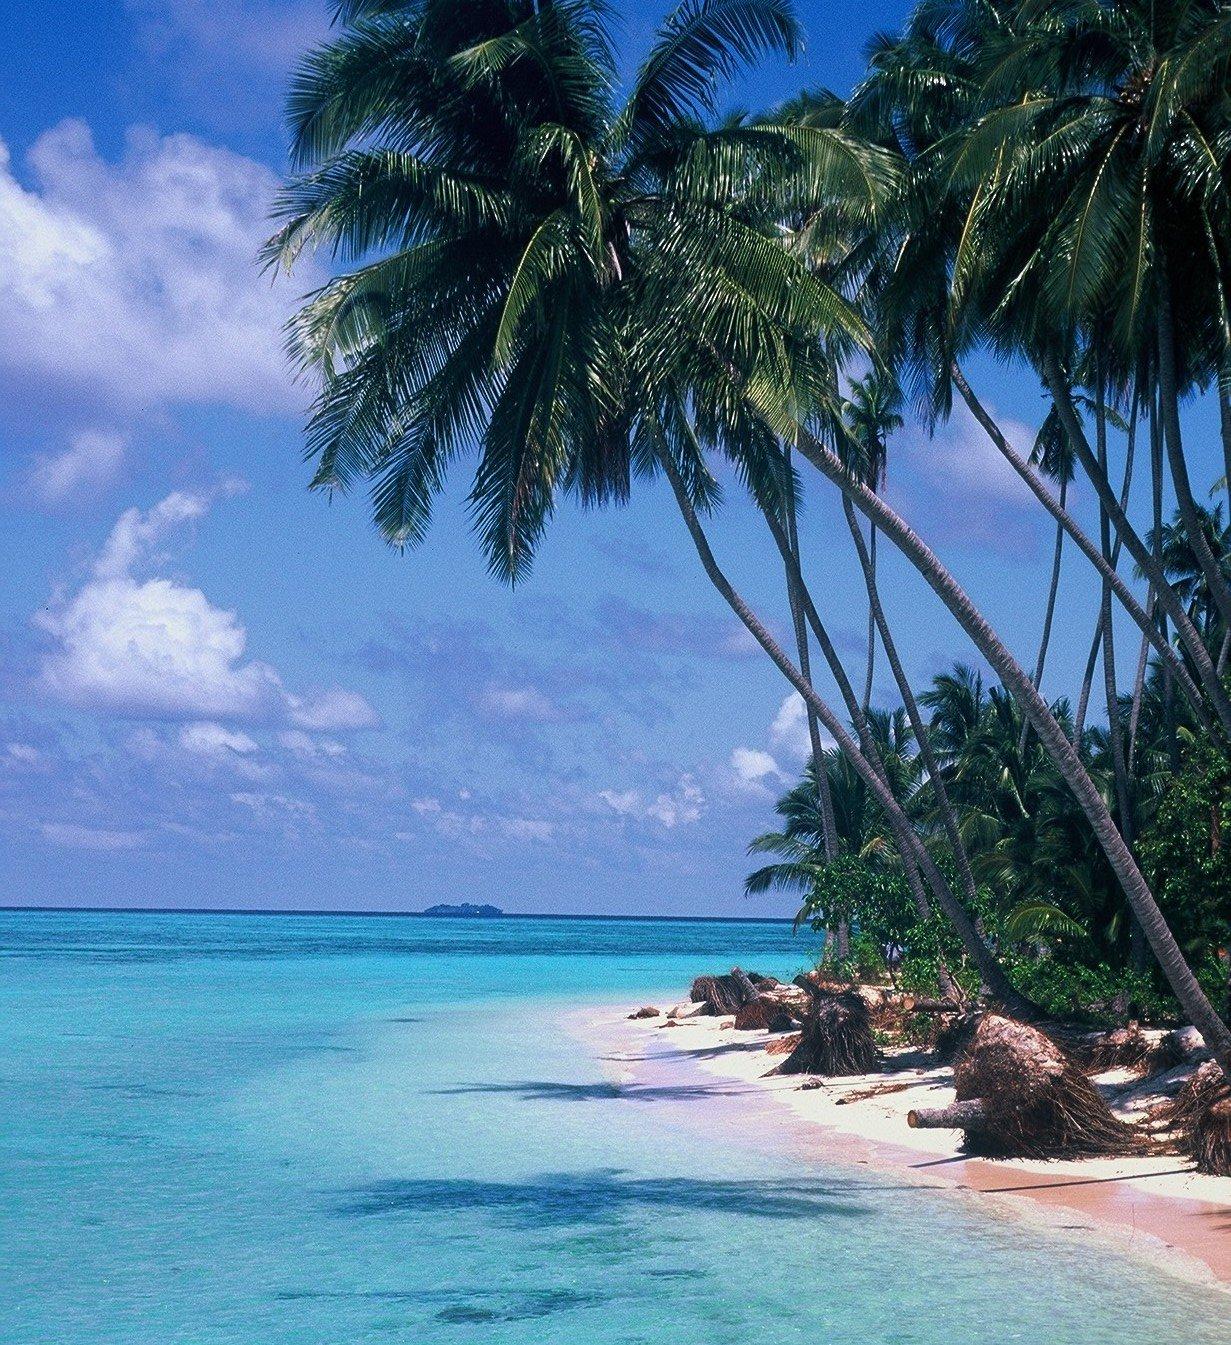 Borneo Island: Mabul Island, Sabah Borneo